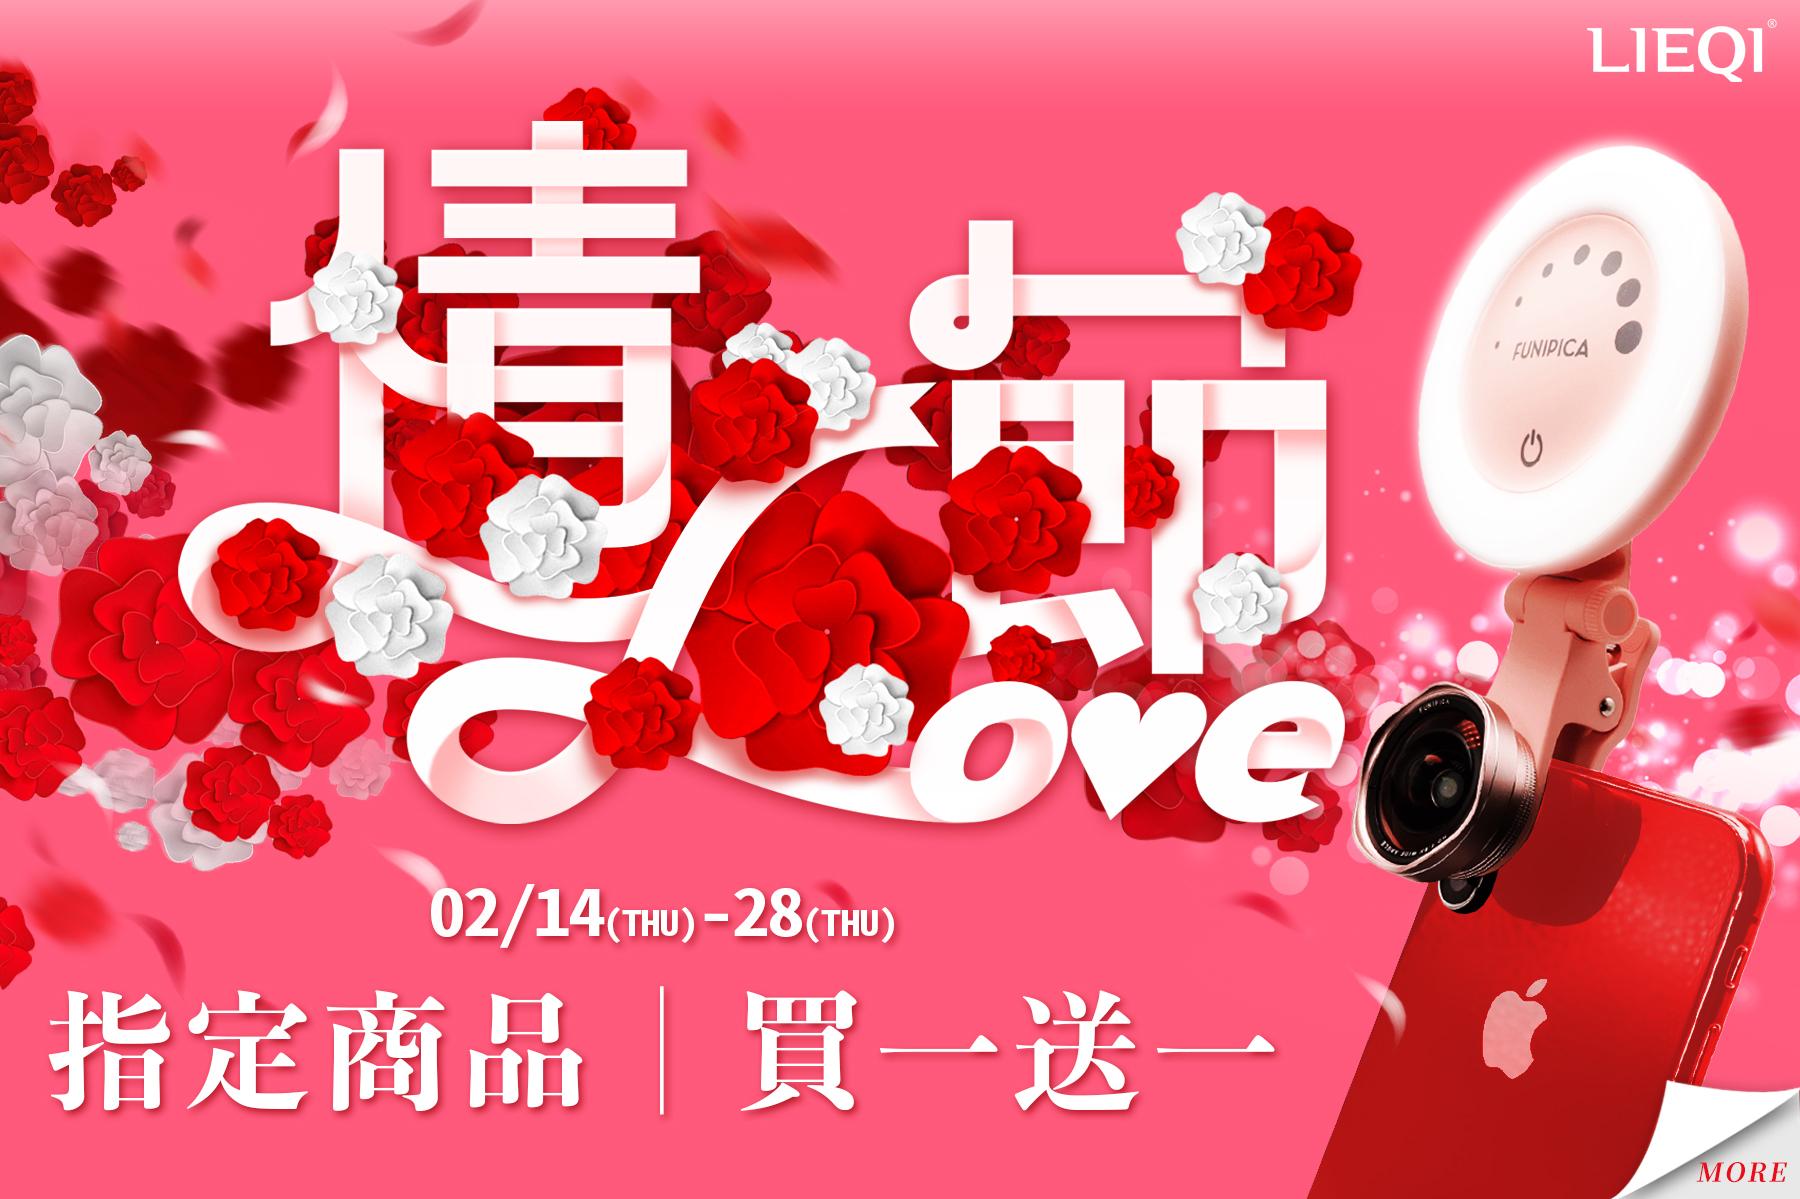 LIEQI TAIWAN 情人節優惠活動入口\自拍\直播